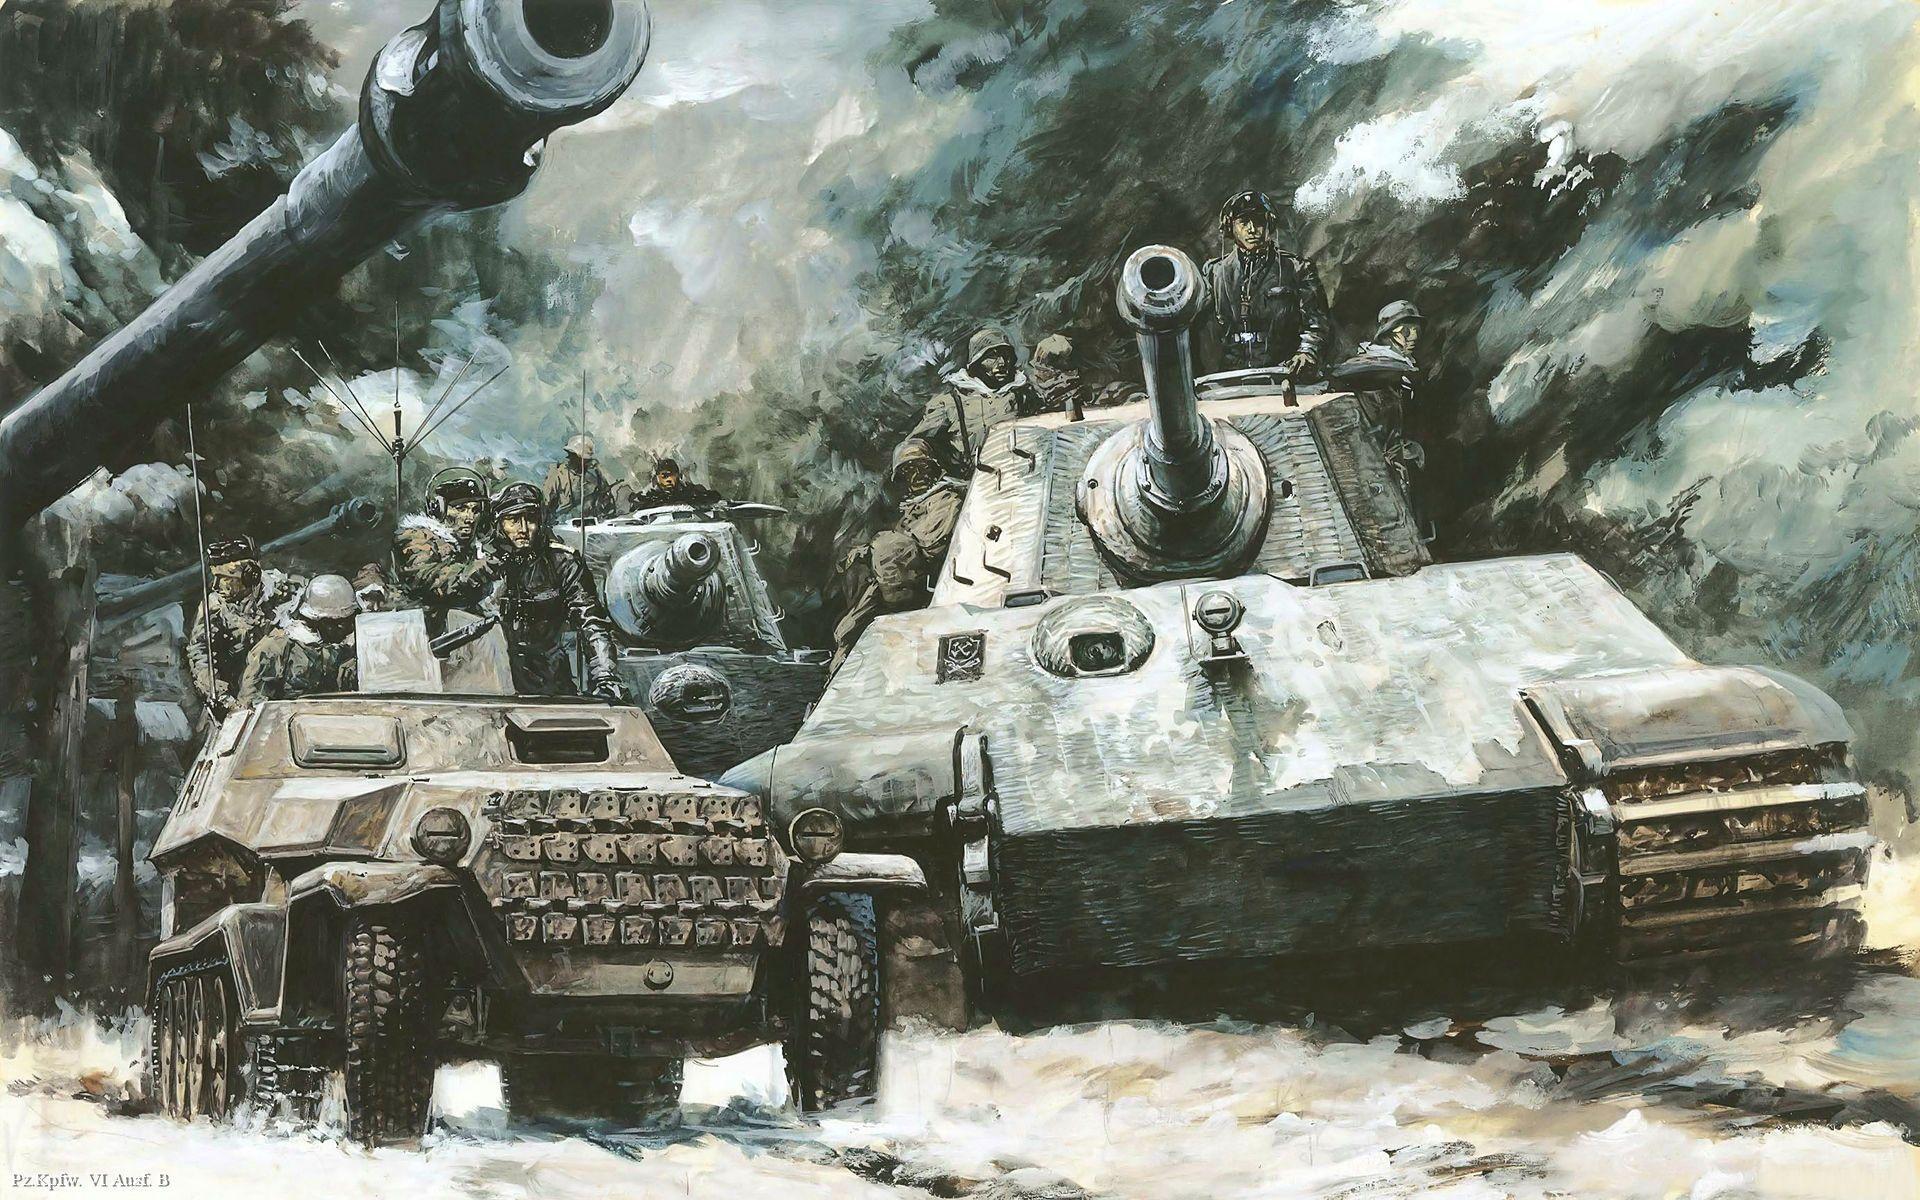 King Tiger Wallpaper